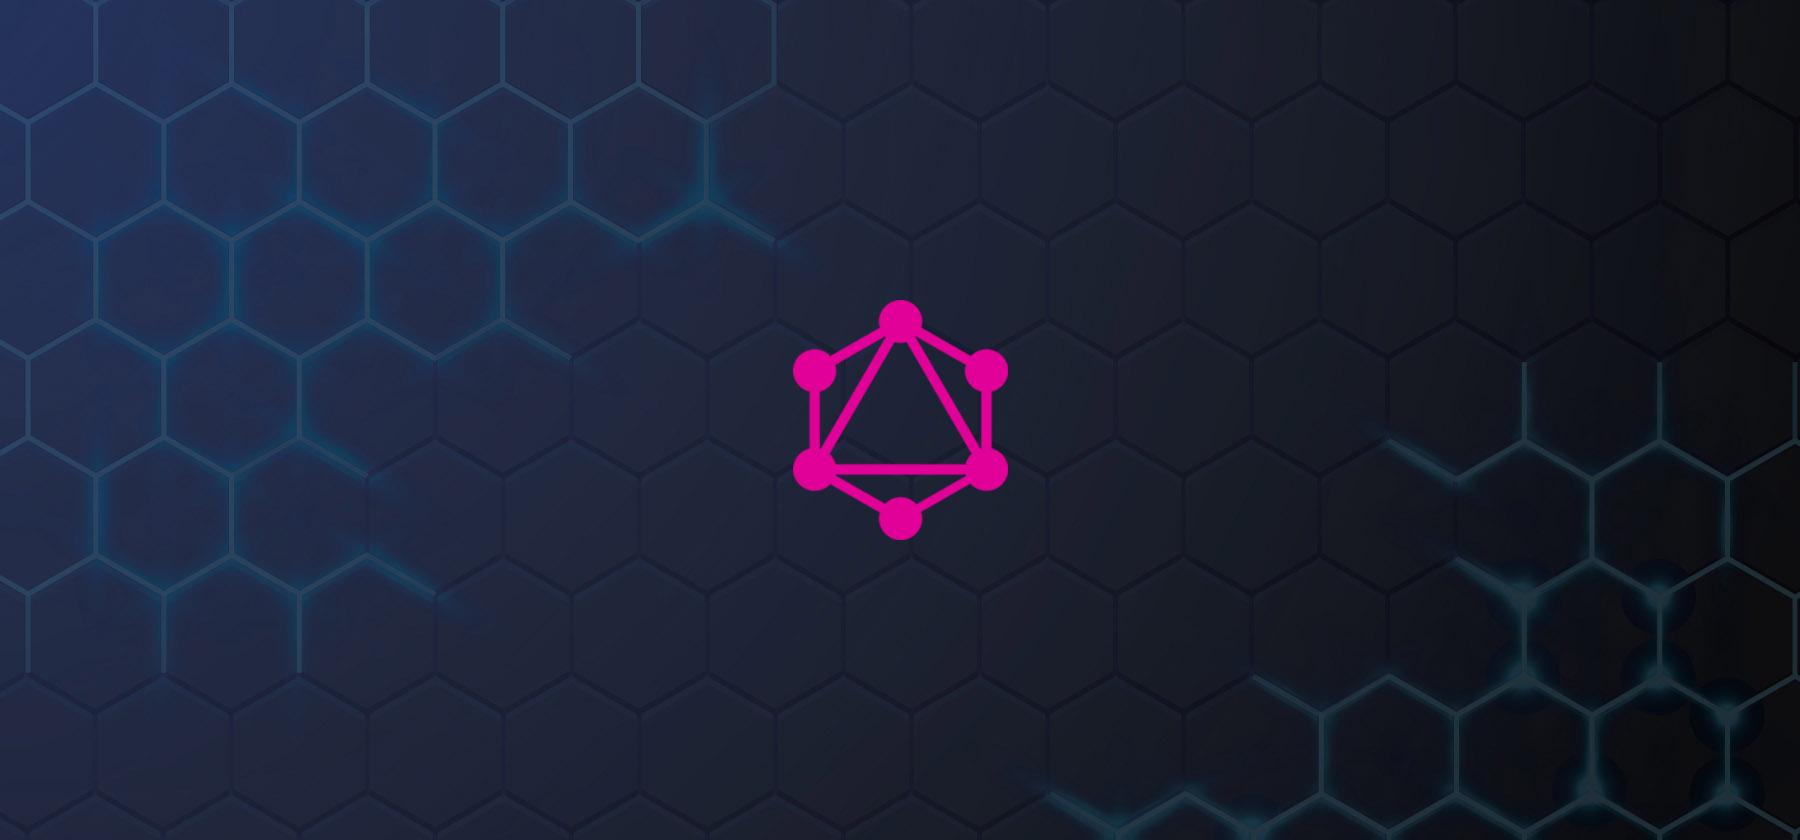 GraphQL: una alternativa a Rest. Logo de GraphQL sobre fondo oscuro